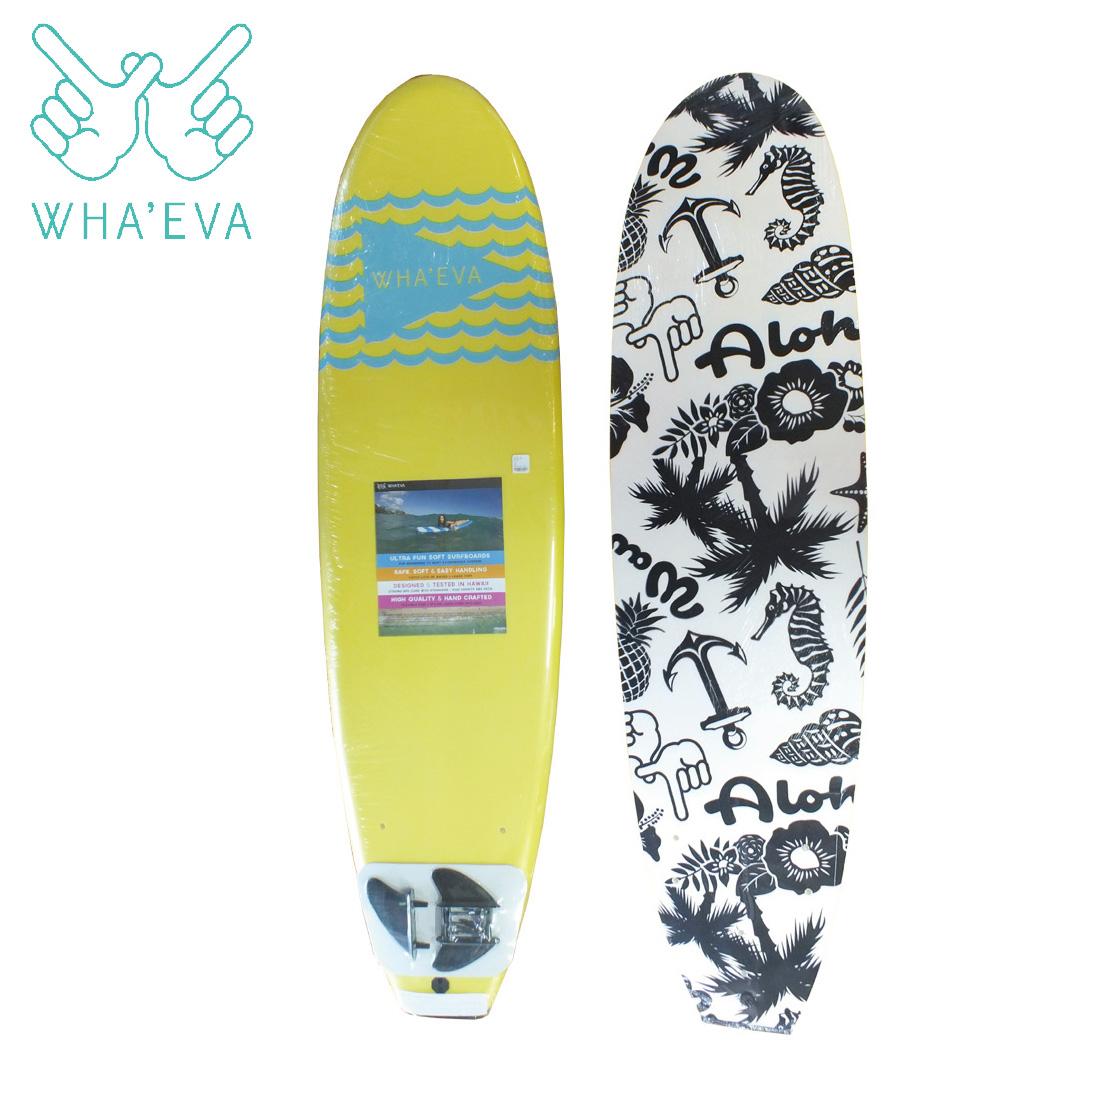 SURF WHA'EVA FLAG 7'0 Yellow ソフトサーフボード EVA素材 軽量 ソフト素材 WHA EVA ワー イーブイエー